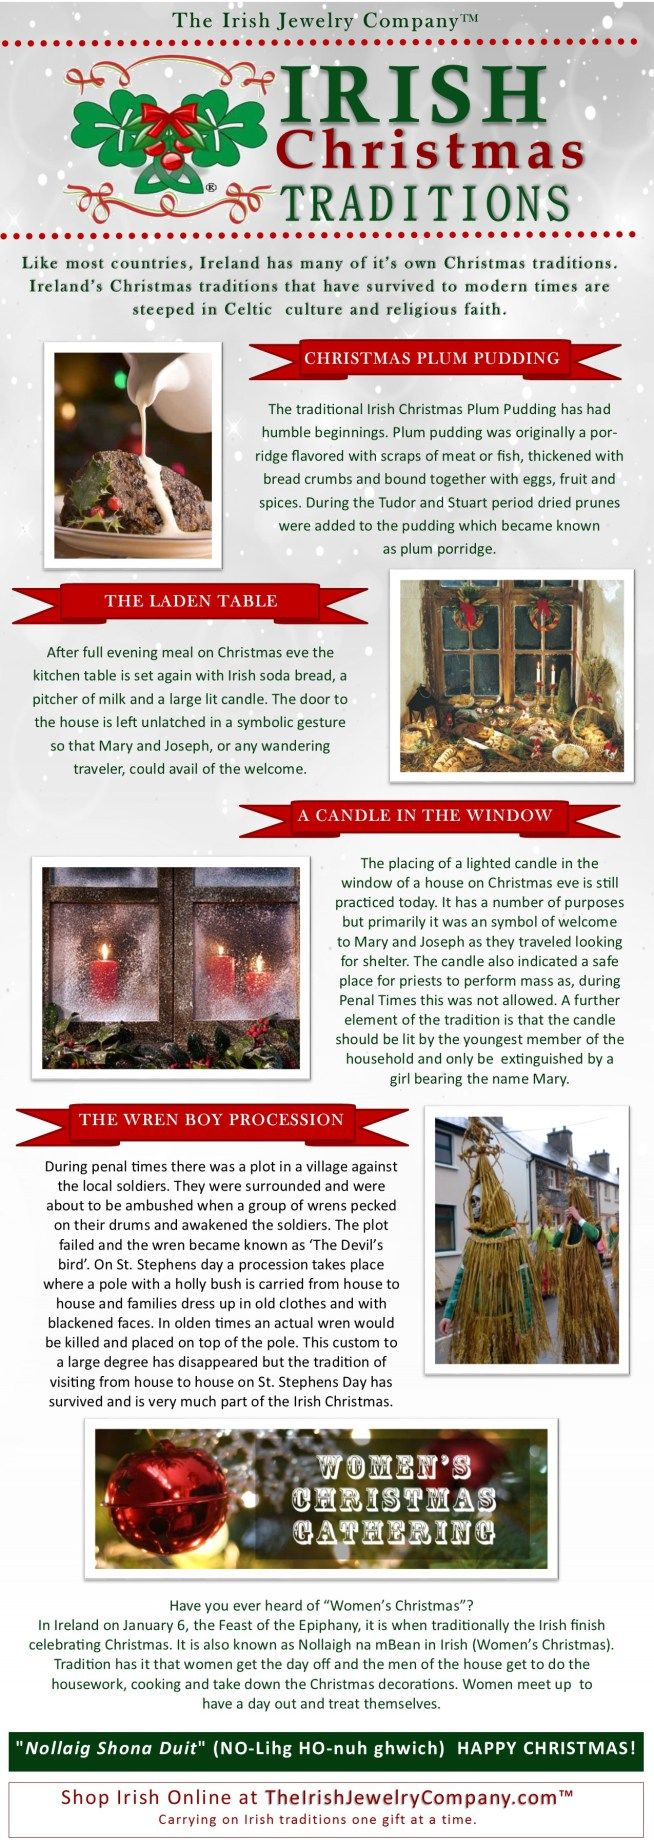 irish christmas traditions infographic